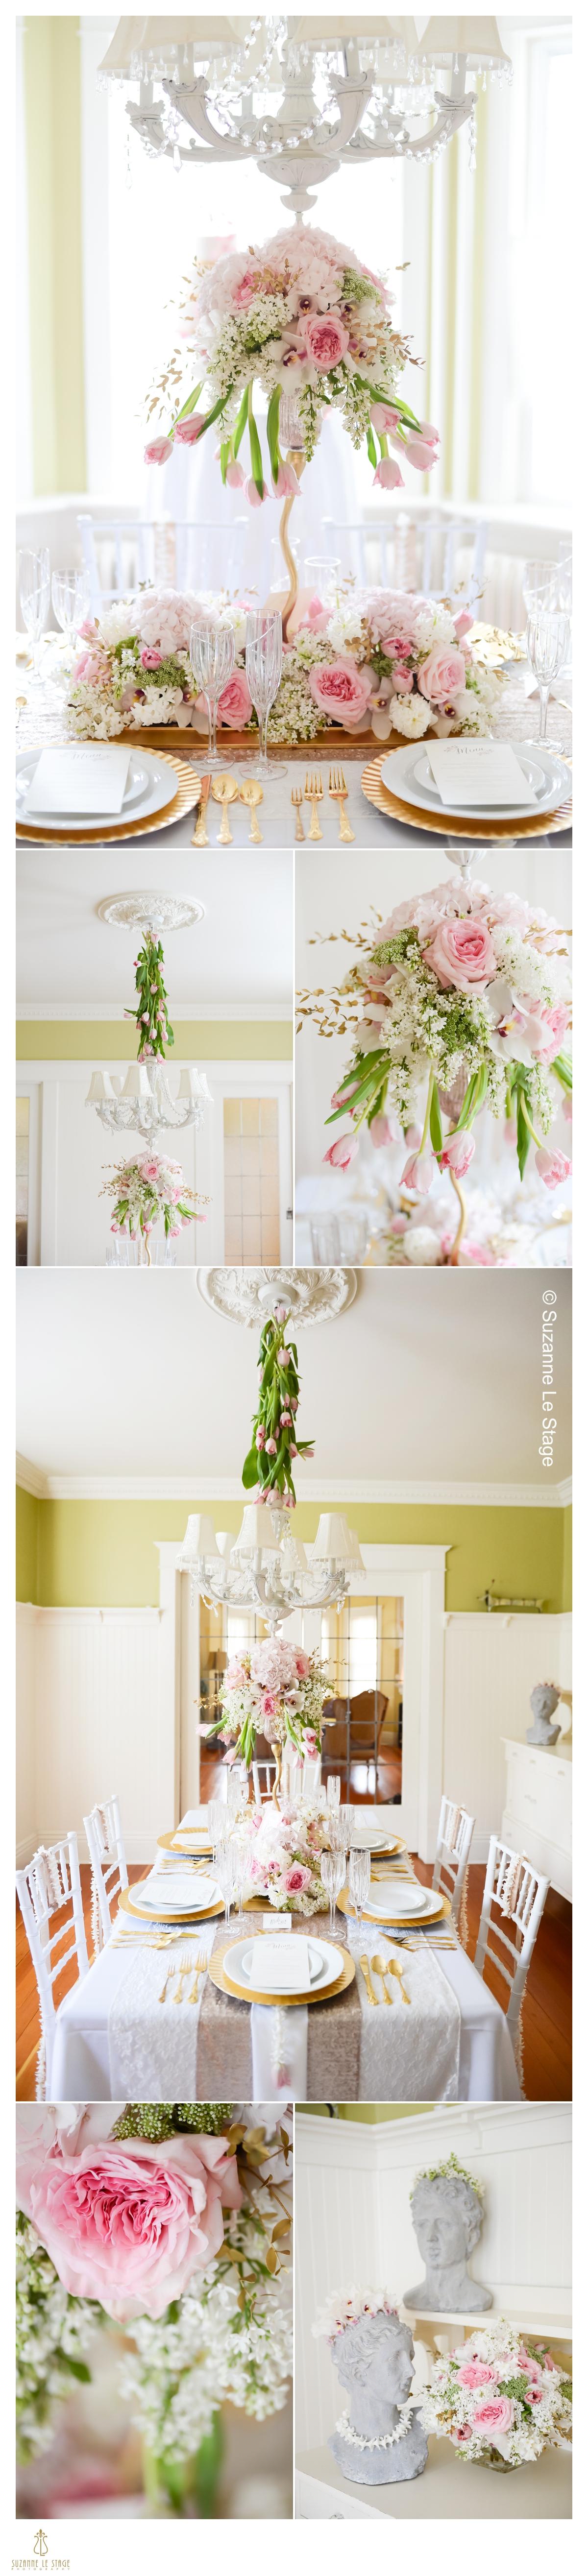 Cherry Blossom Styled Shoot Kelowna Okanagan Wedding Photography